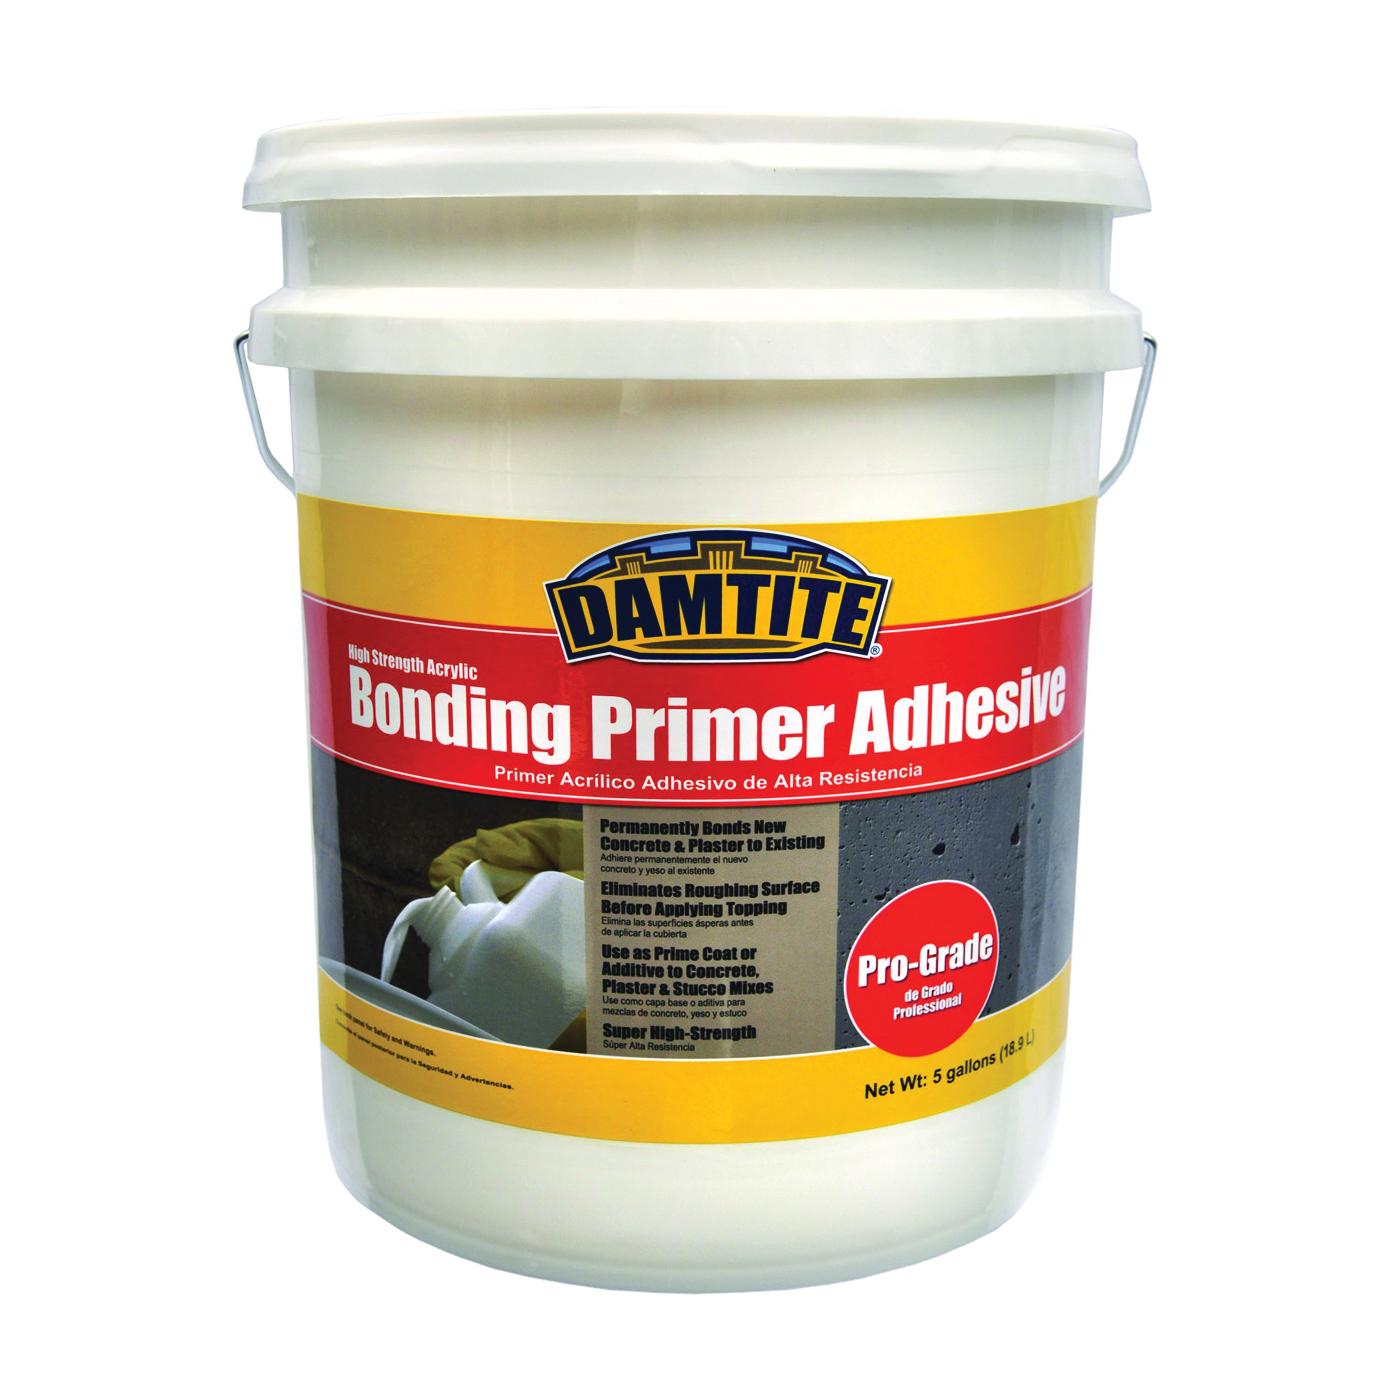 Picture of DAMTITE 05650 Primer Adhesive, Liquid, Ammonia, White, 5 gal Package, Pail